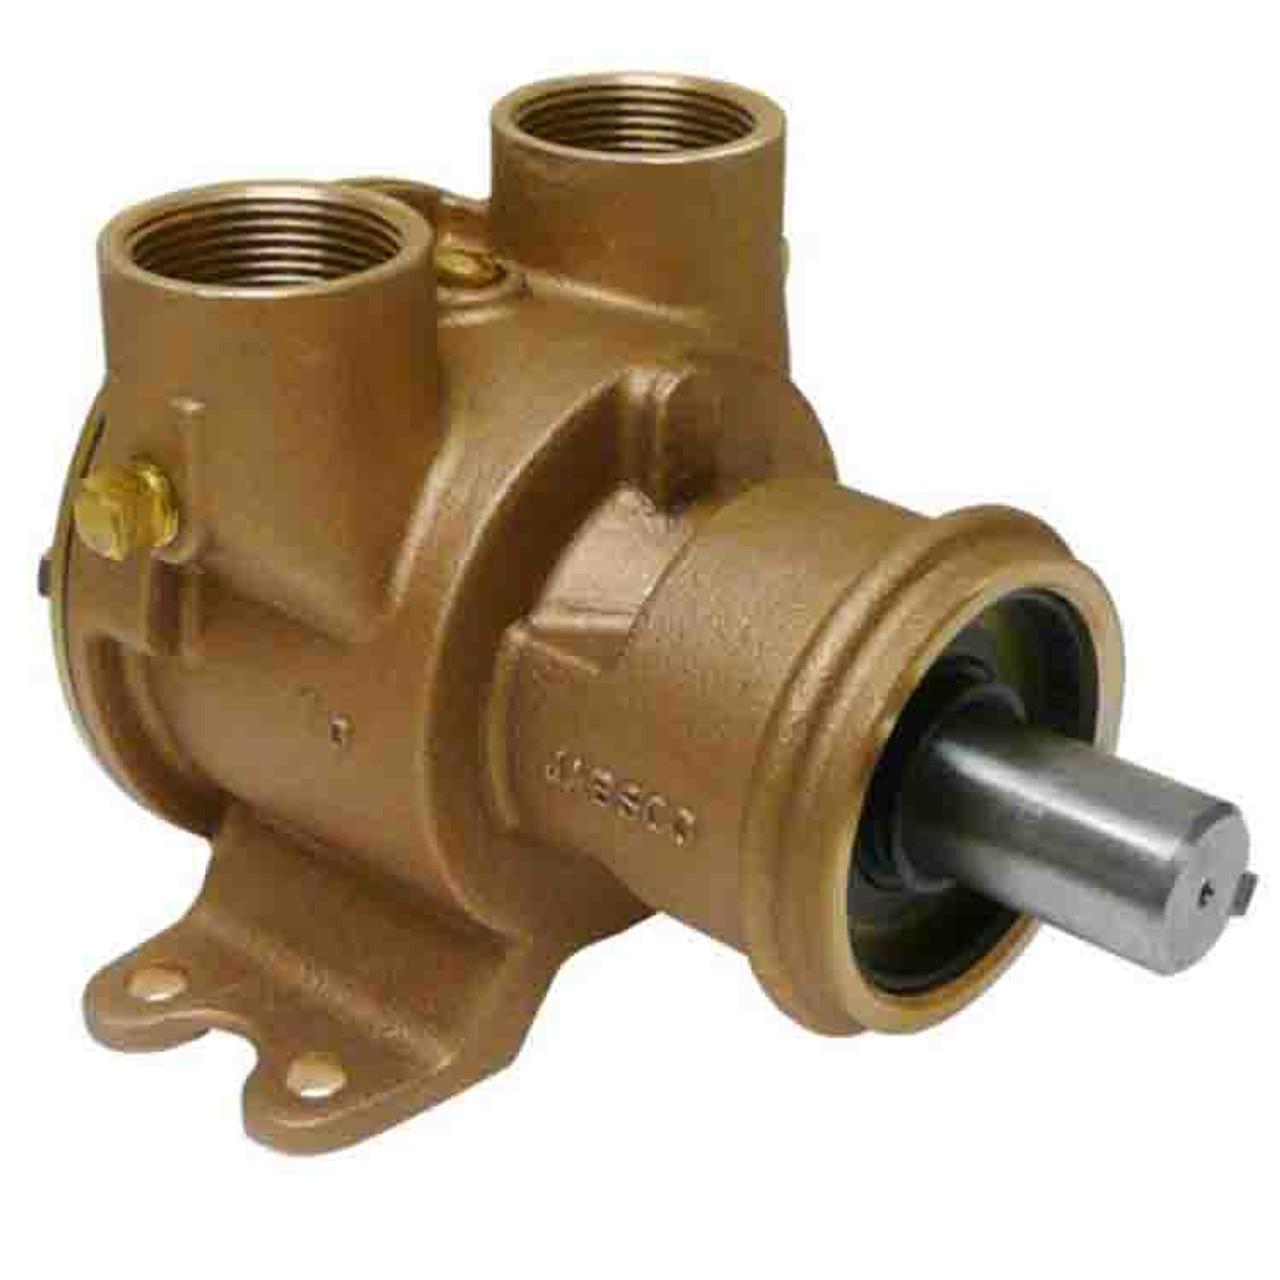 Jabsco Engine Cooling Pump - Size 200 (1-1/4